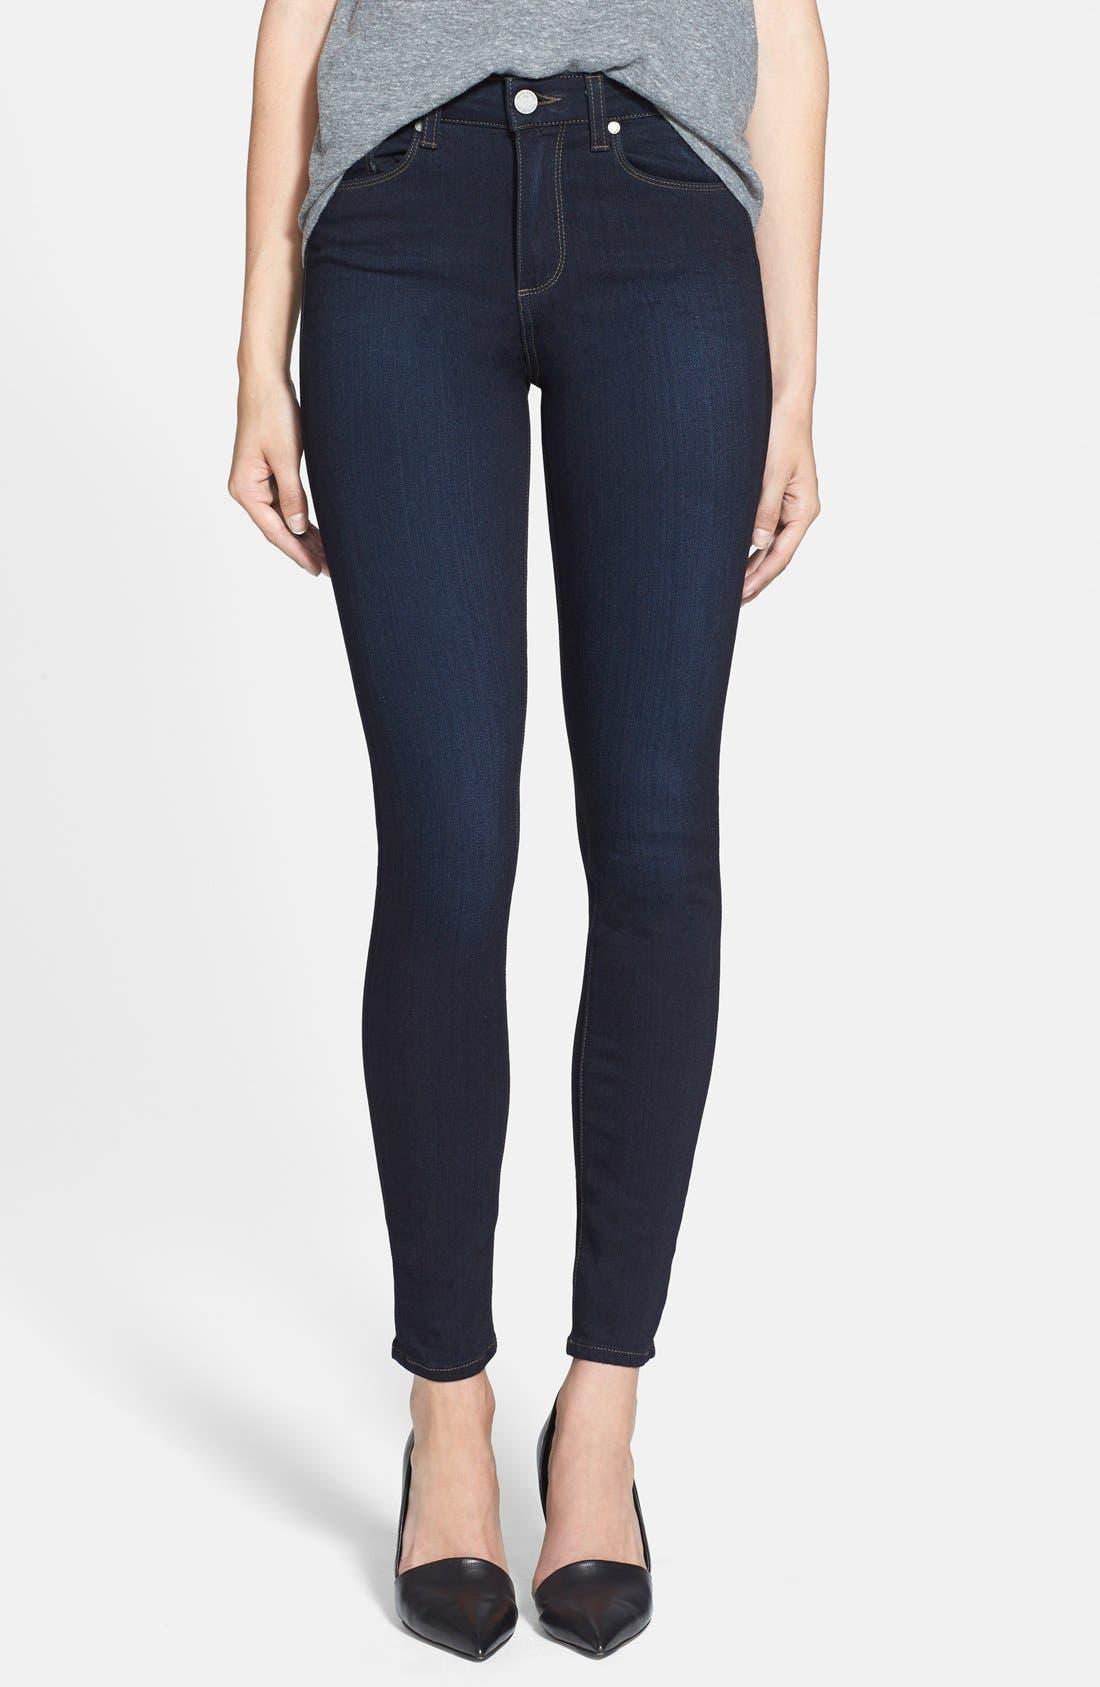 Main Image - PAIGE Transcend - Hoxton High Waist Ultra Skinny Jeans (Mona)